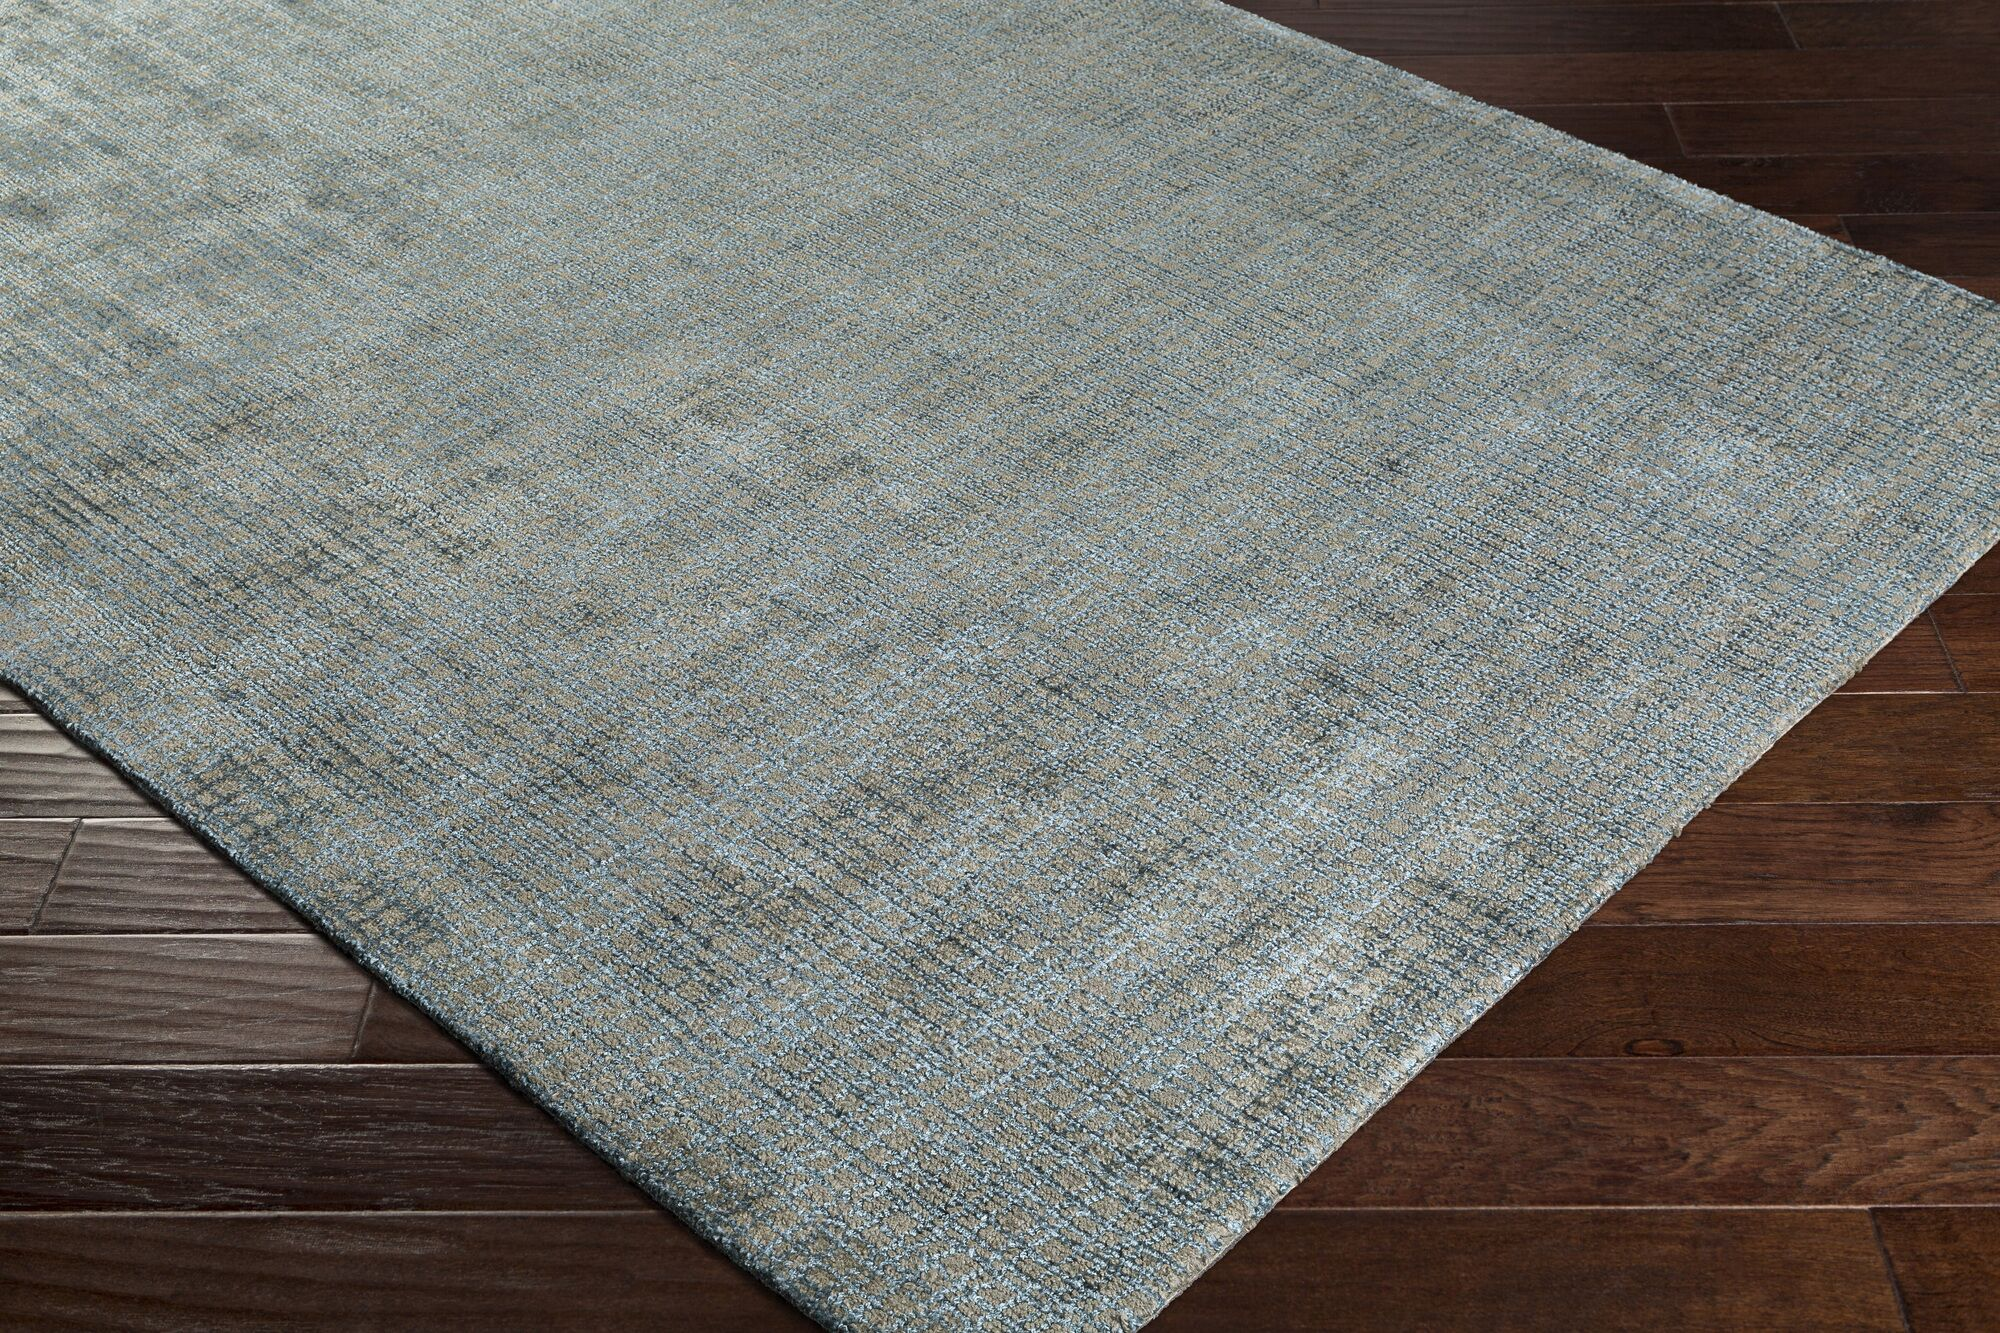 Dili Hand-Woven Silk Teal/Brown Area Rug Rug Size: Rectangle 8' x 10'